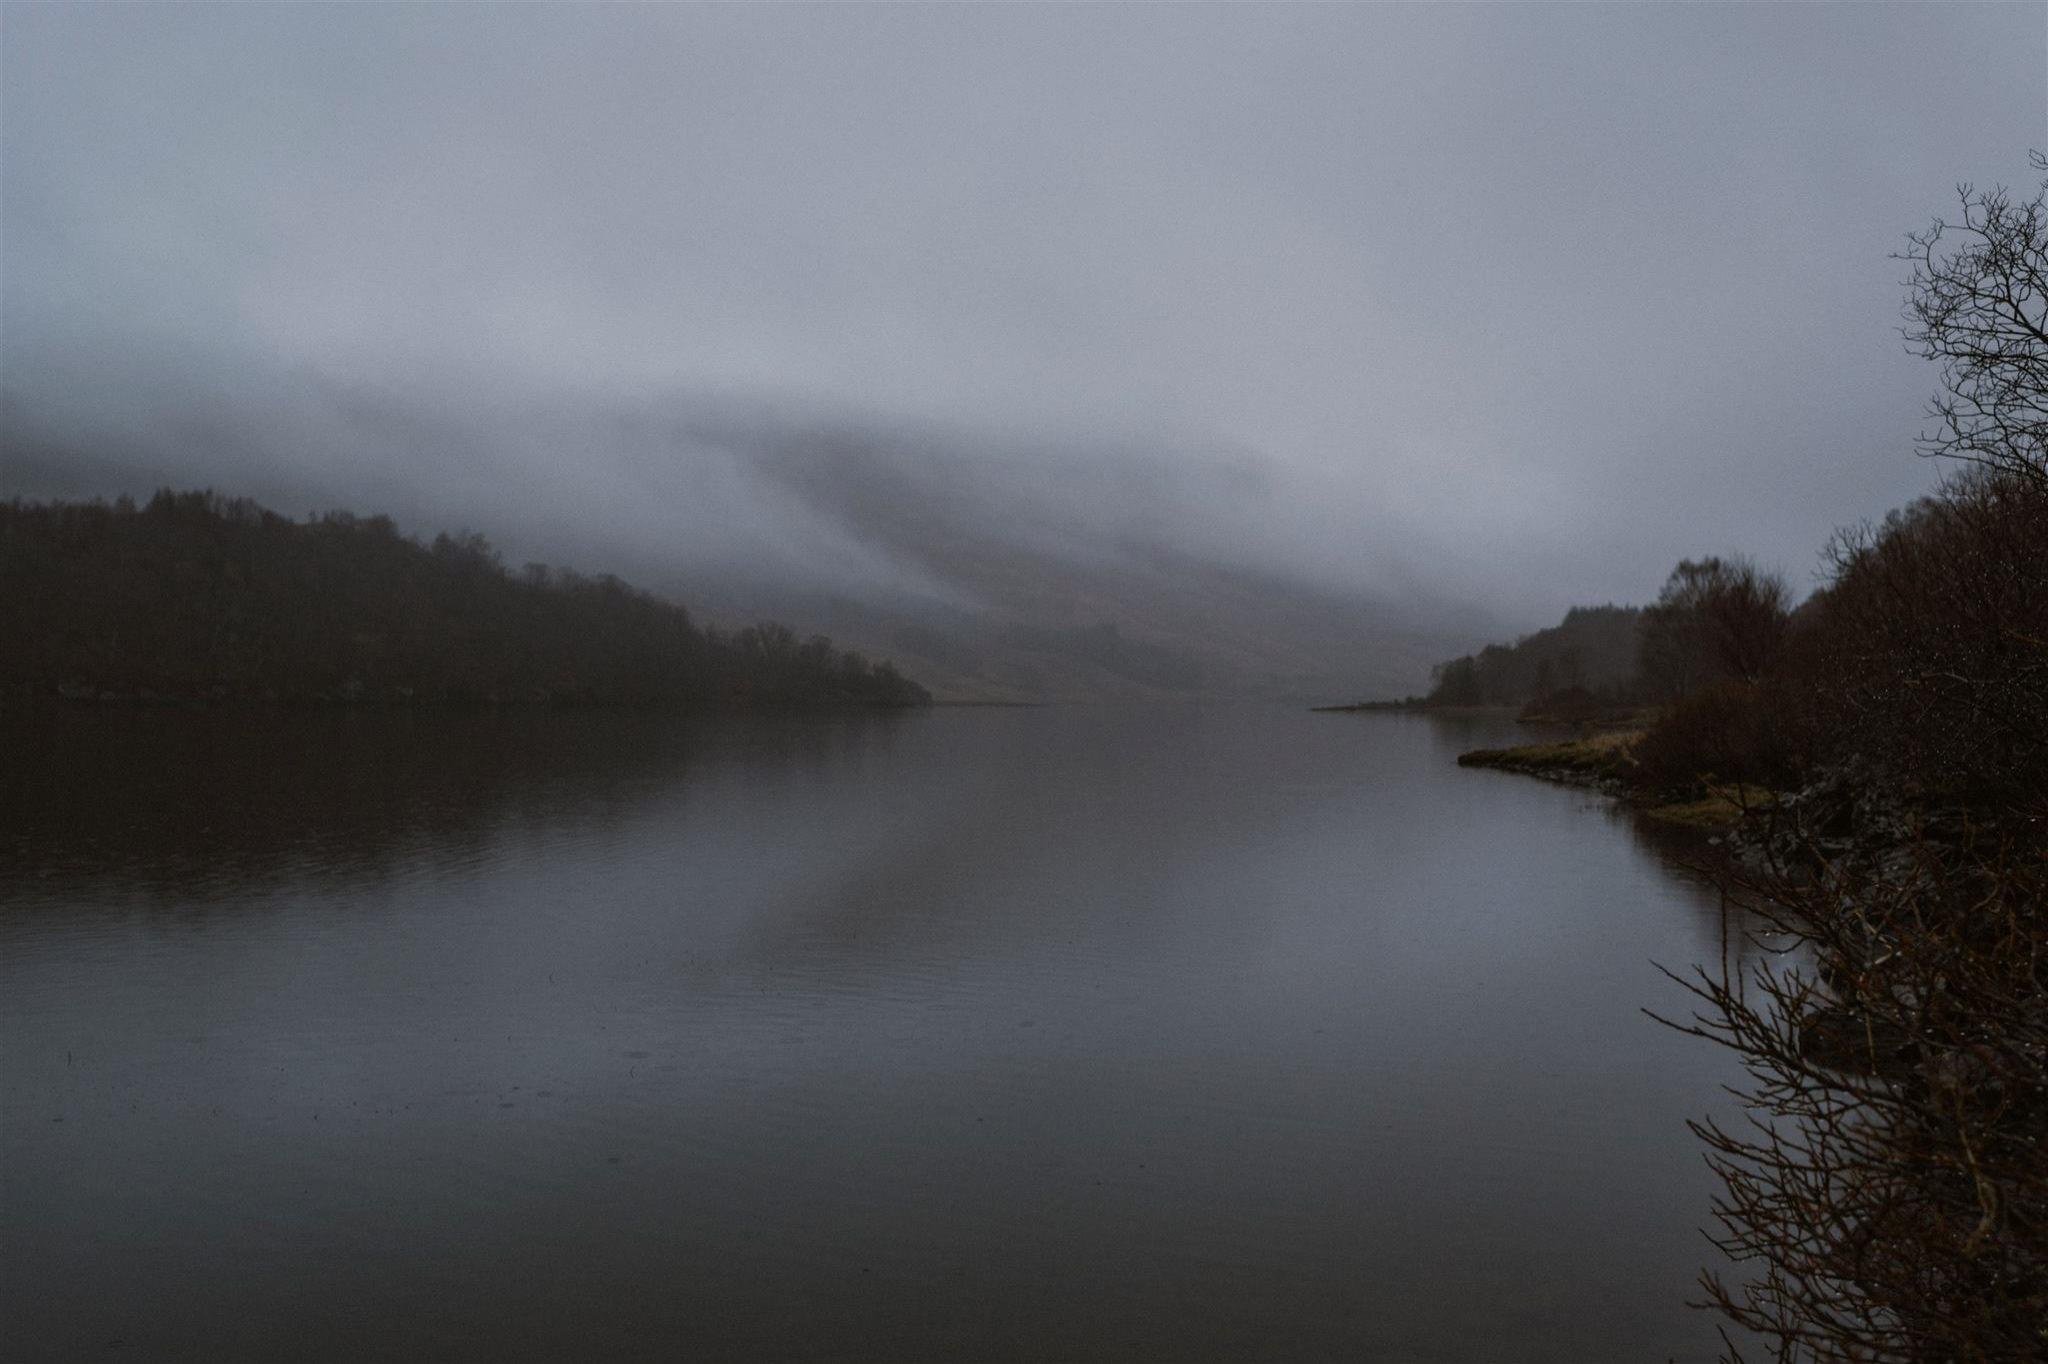 A misty Scottish loch in the Highlands